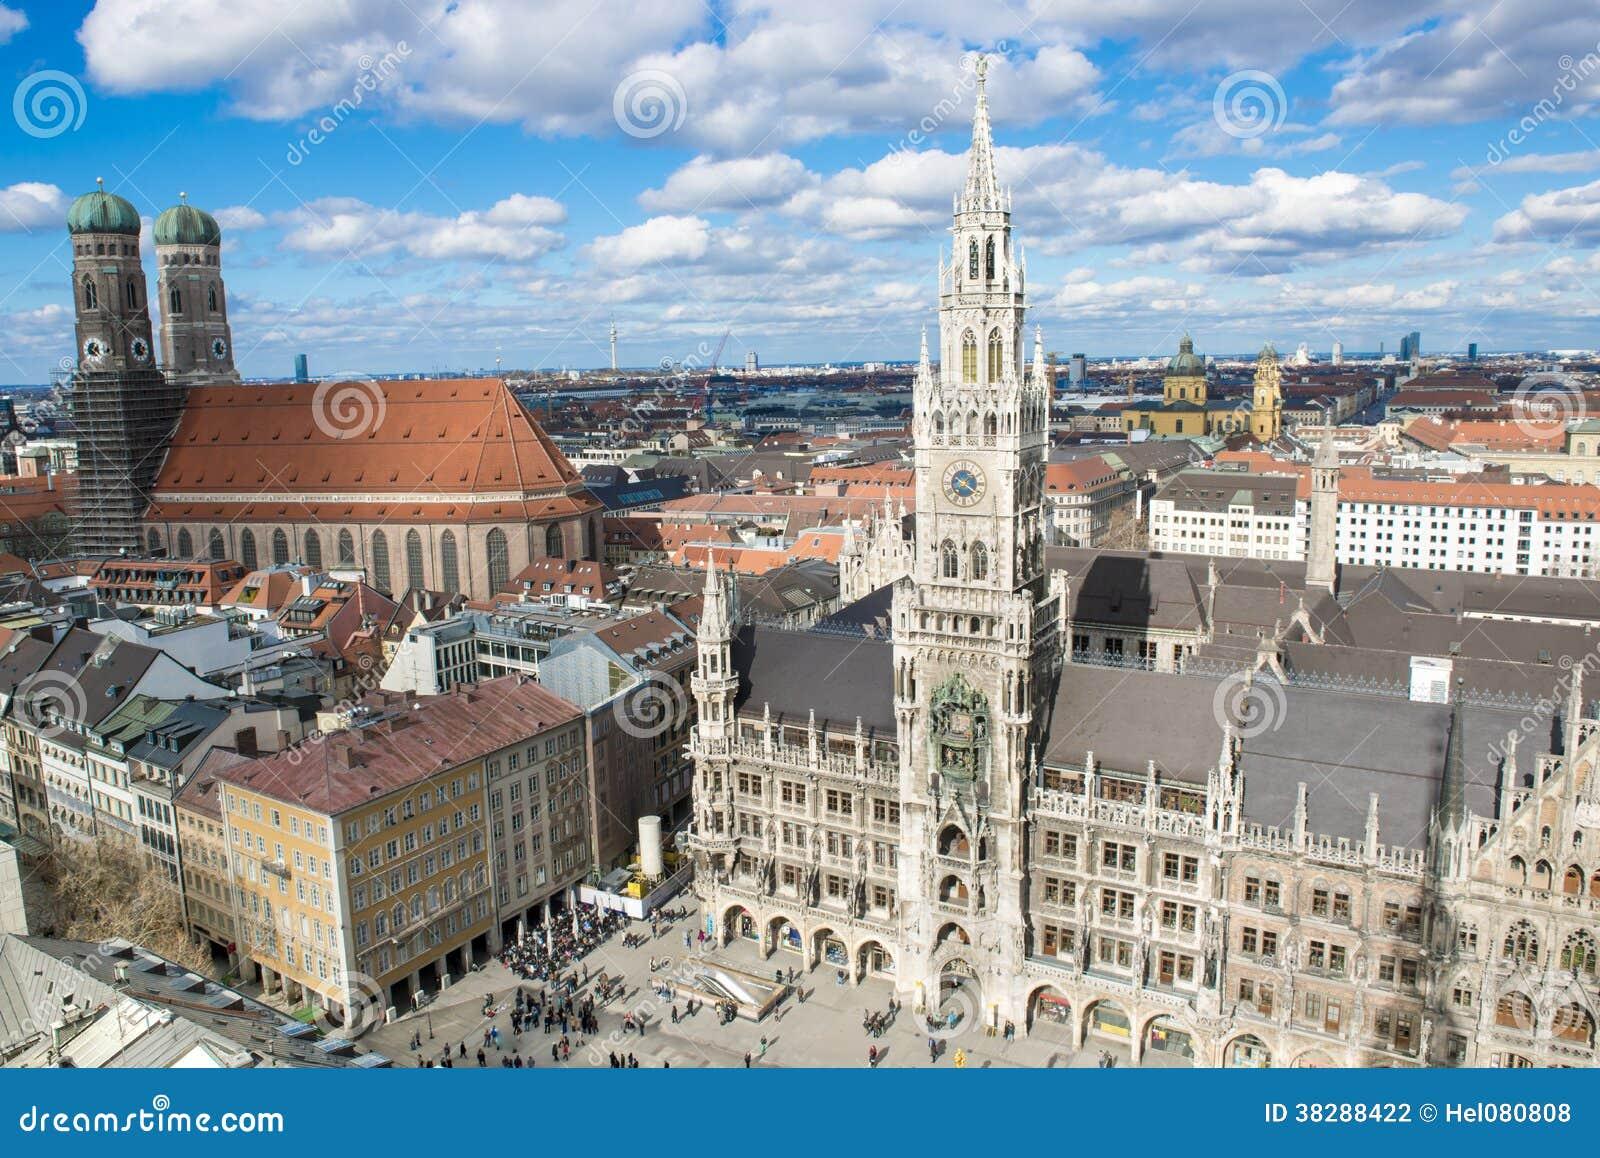 Aerial view Munich